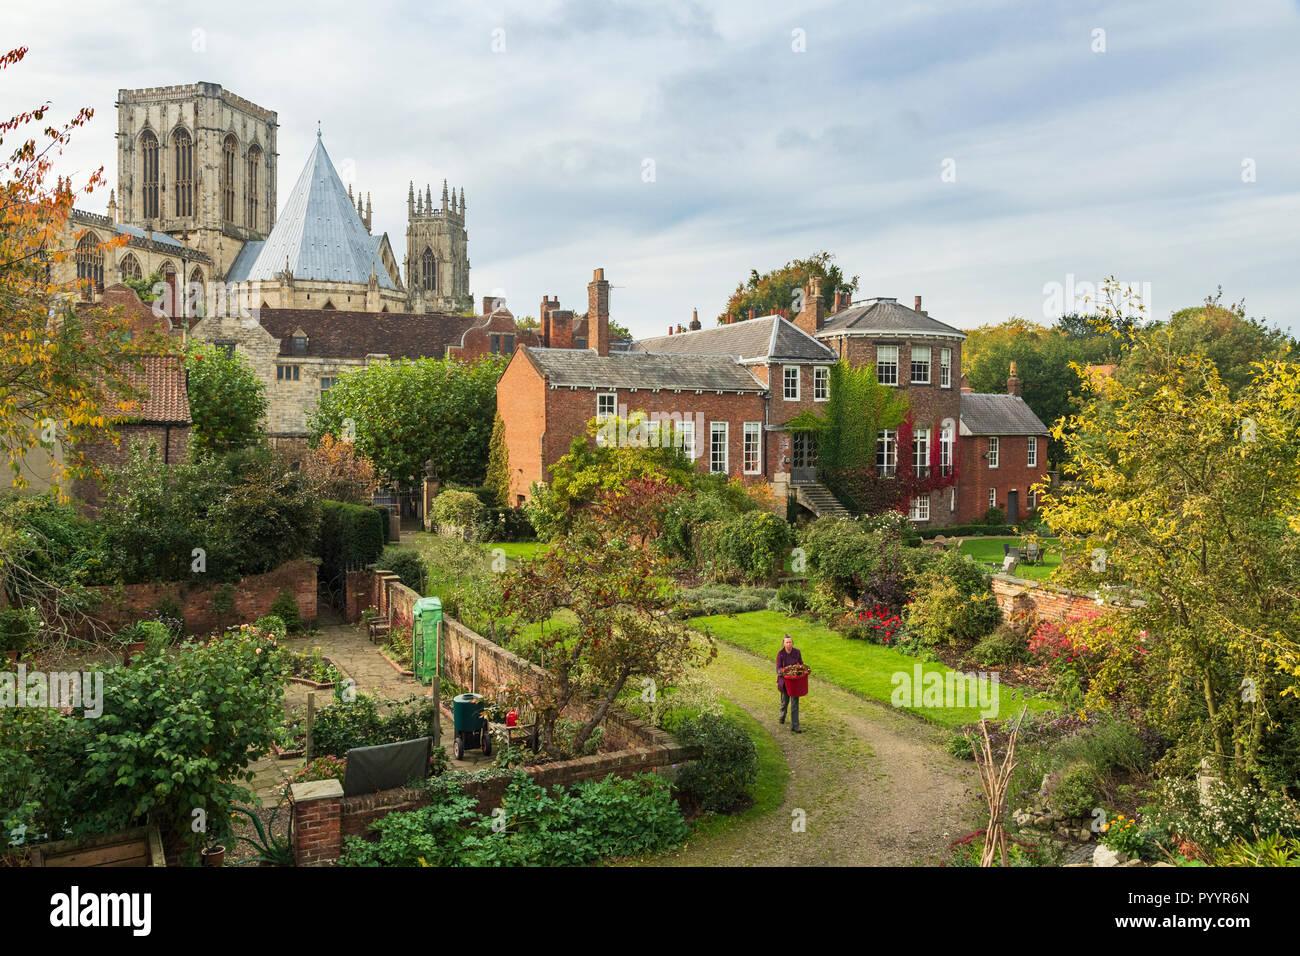 Scenic view of historic buildings from city walls - Grays Court (gardener working) Minster & Treasurer's House - York, North Yorkshire, England, UK. - Stock Image